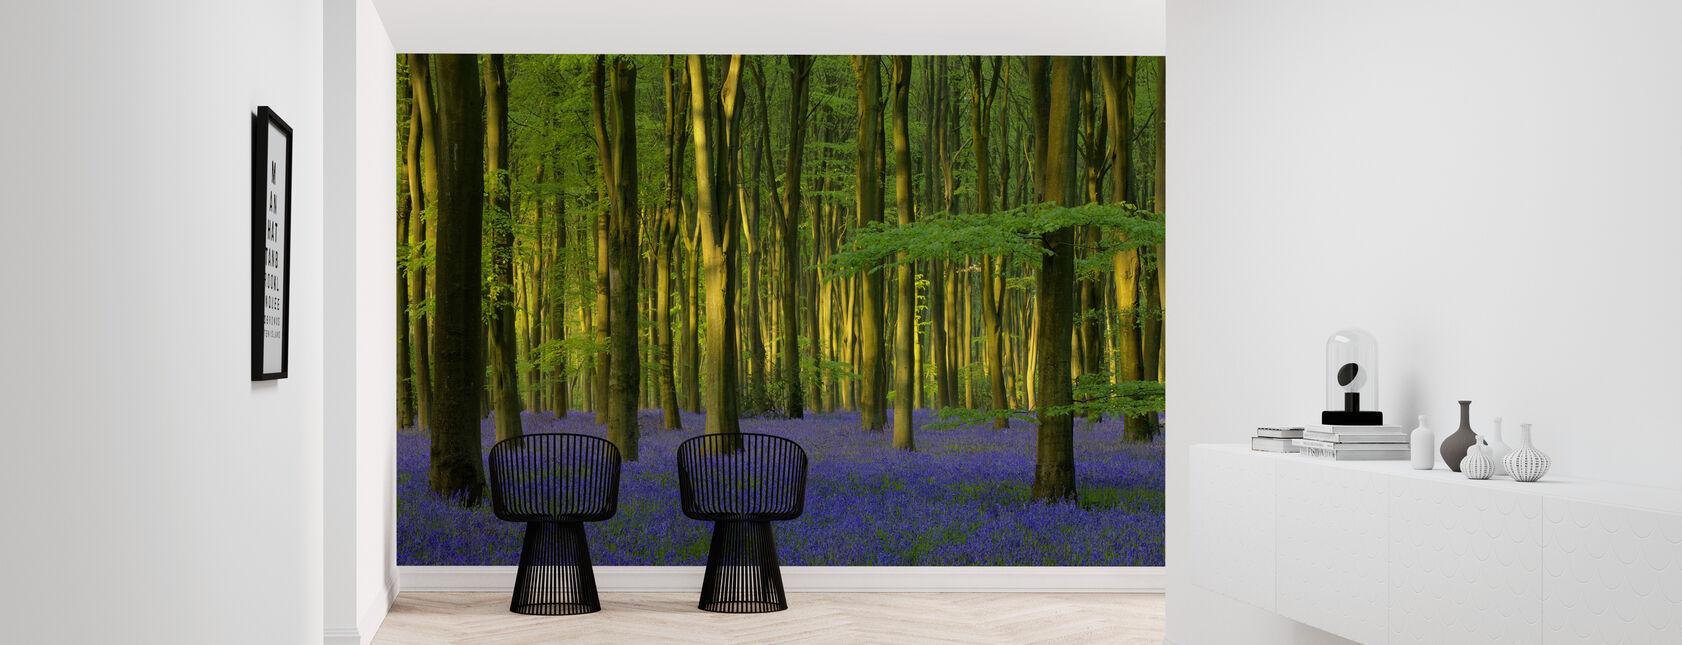 Bluebells in Sunlight - Wallpaper - Hallway